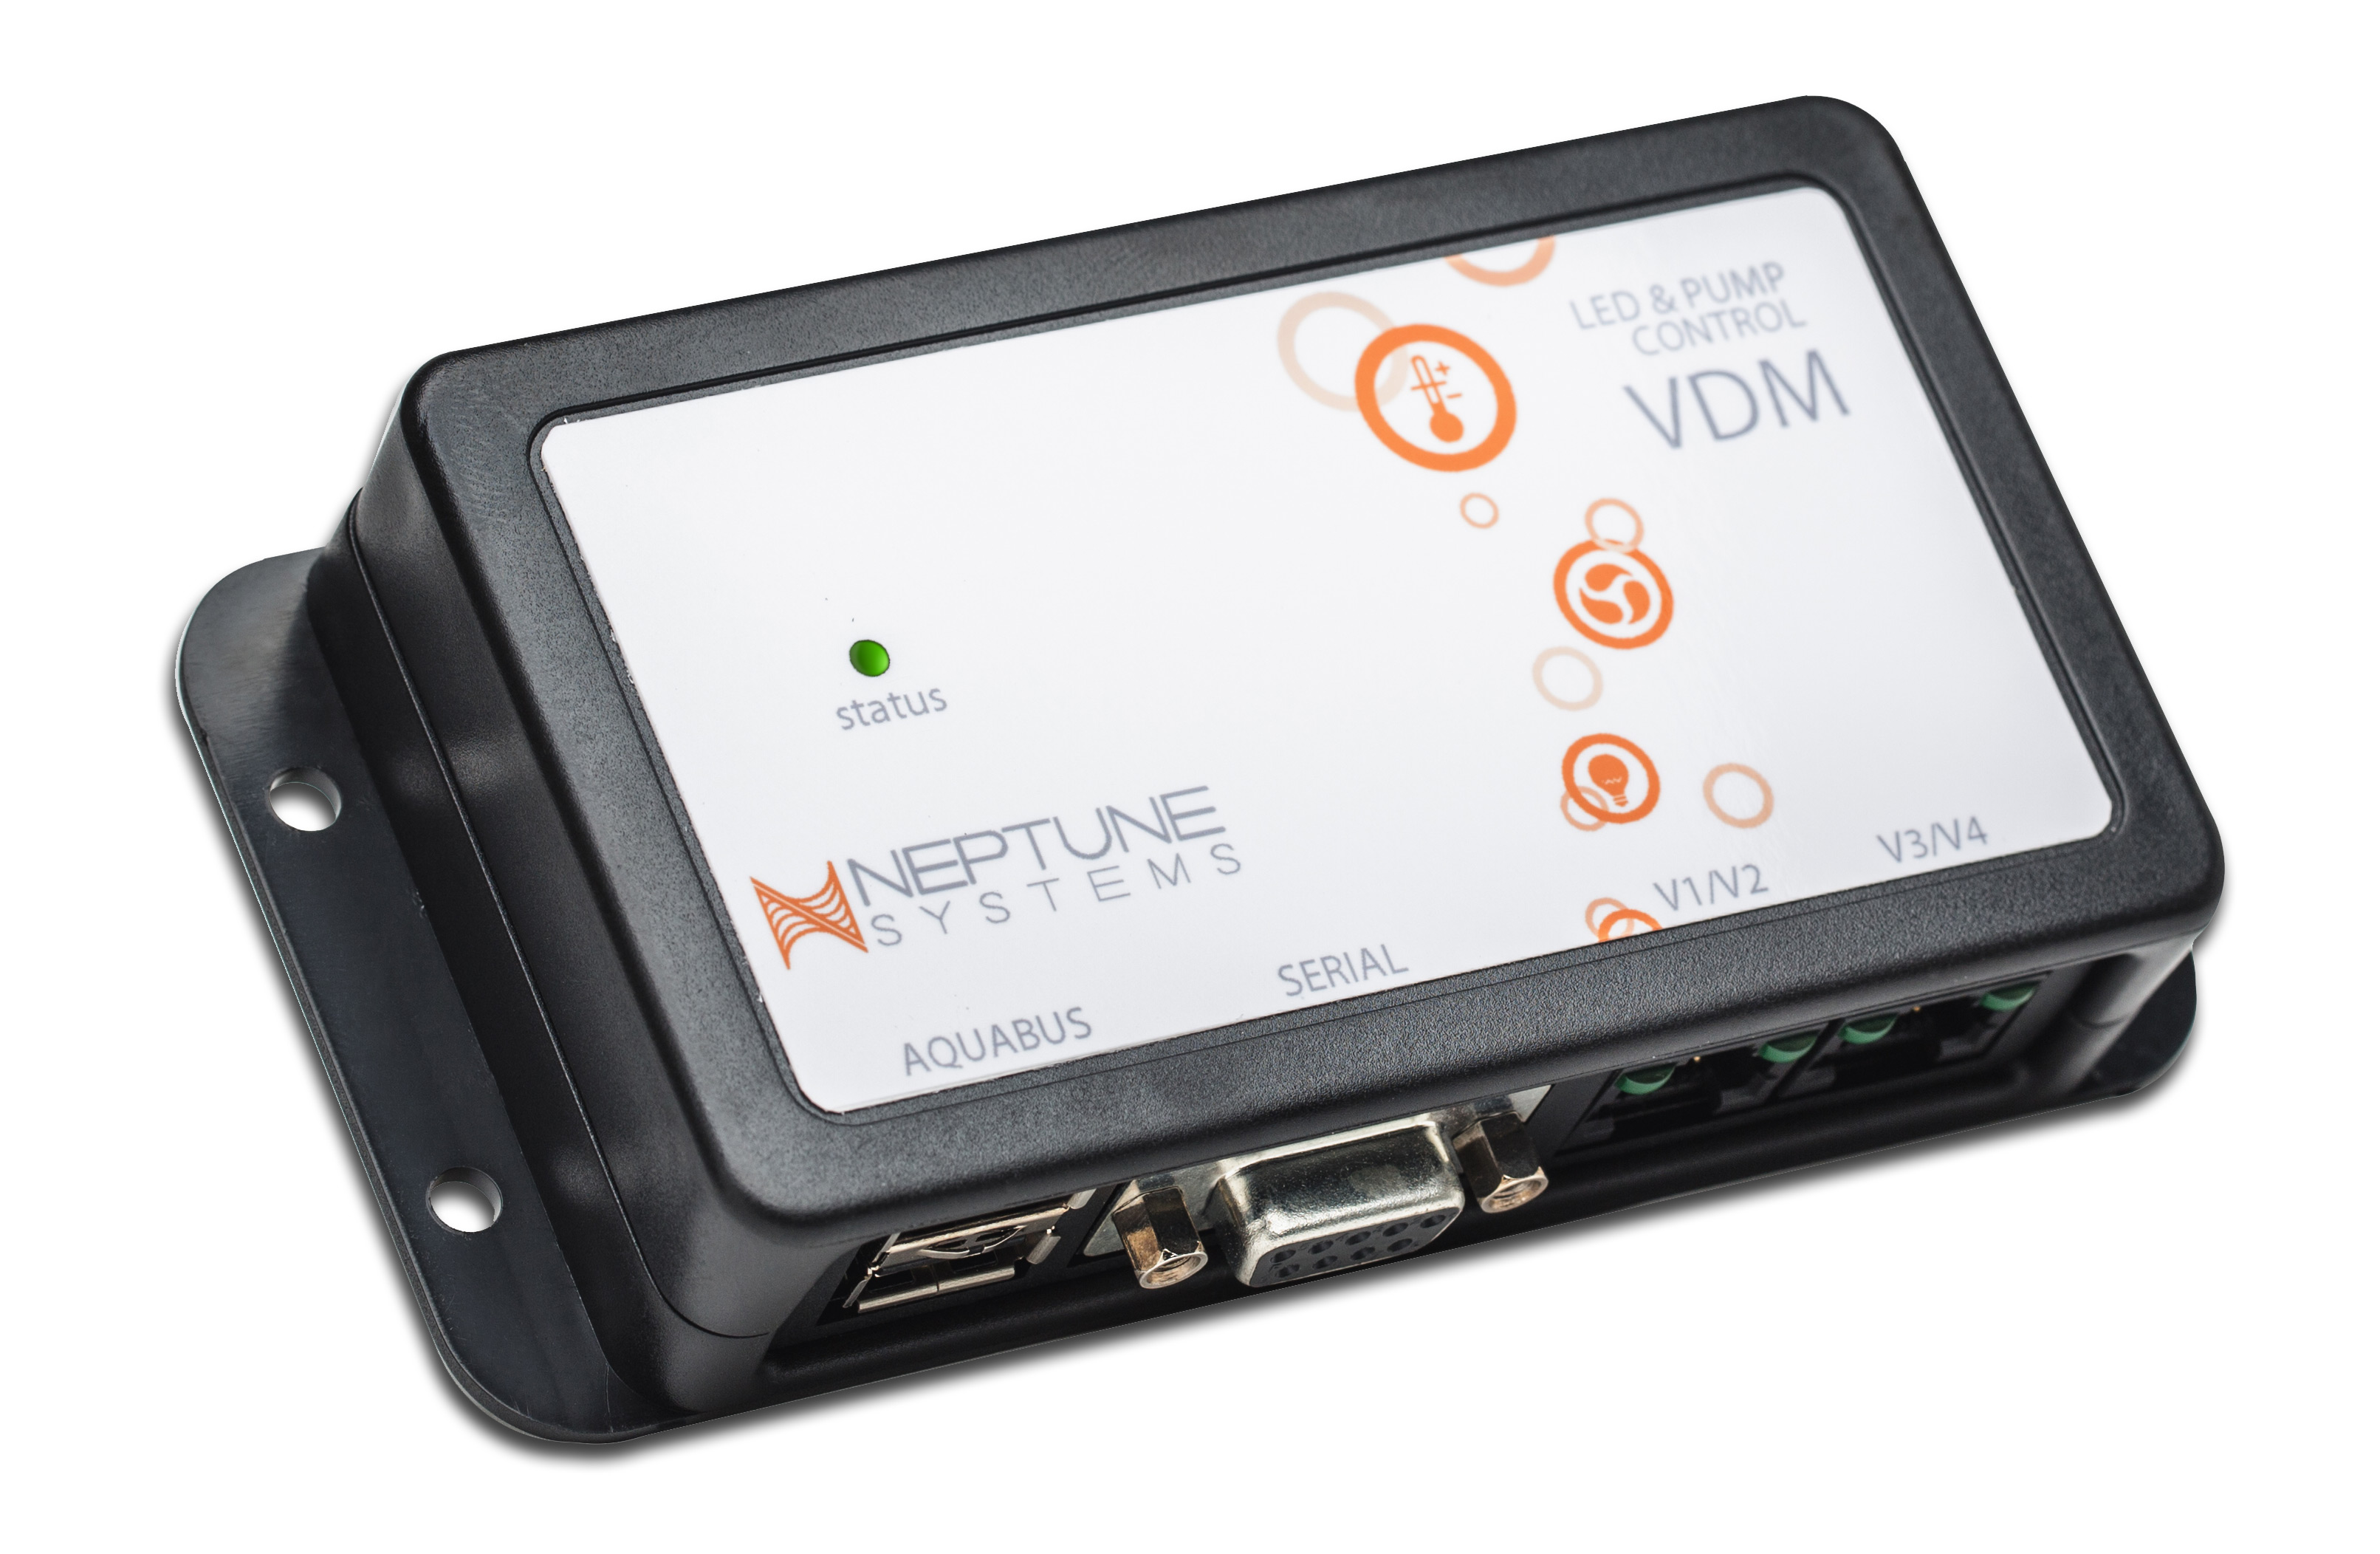 Ai Cable To Apex Vdm Apex Accessories Marine Aquatics